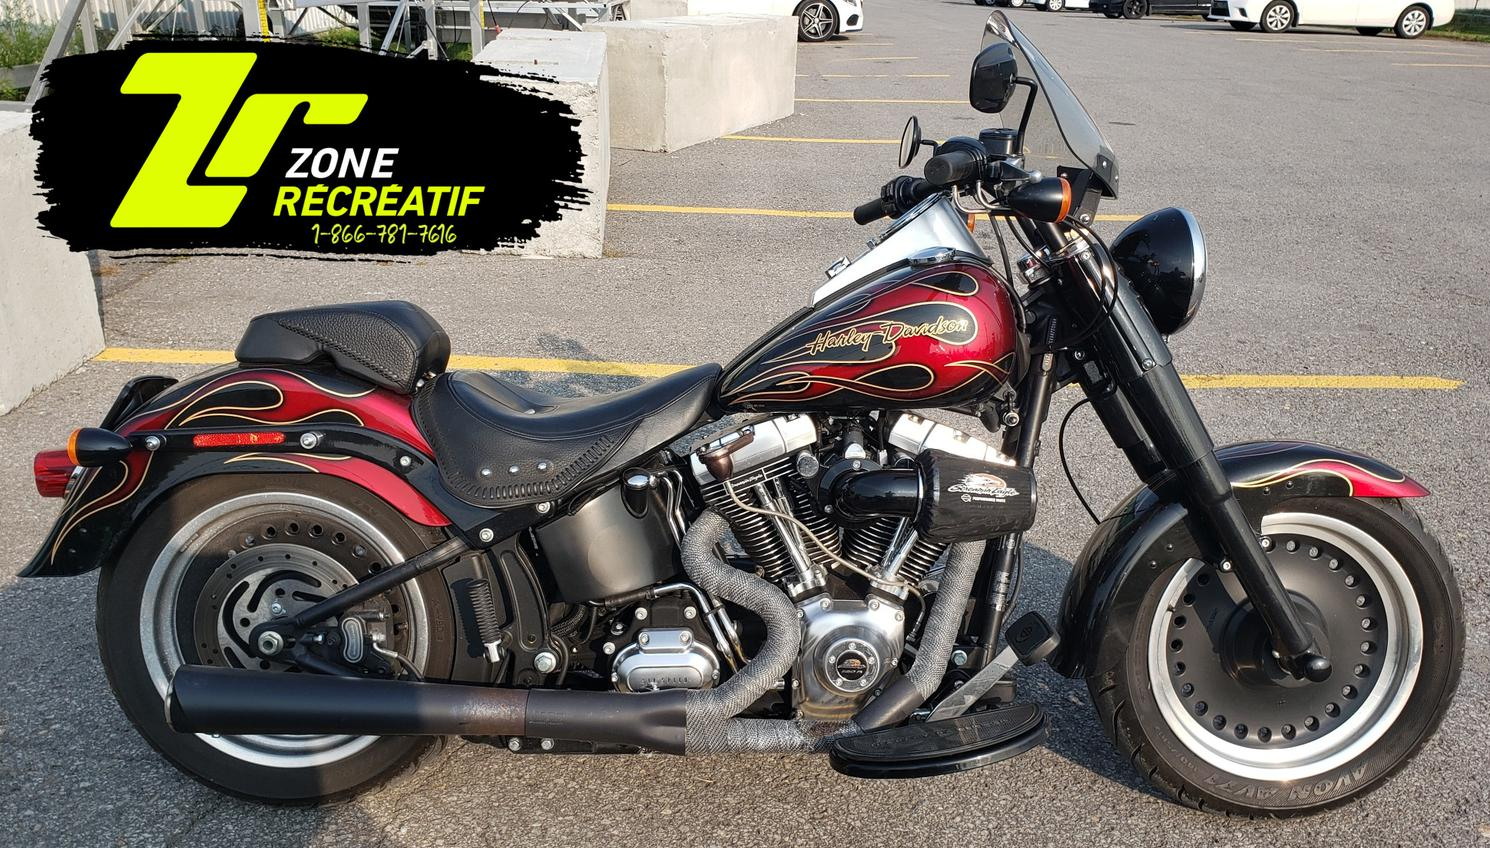 Harley-Davidson FLSTF 120R 2014 - Fat Boy